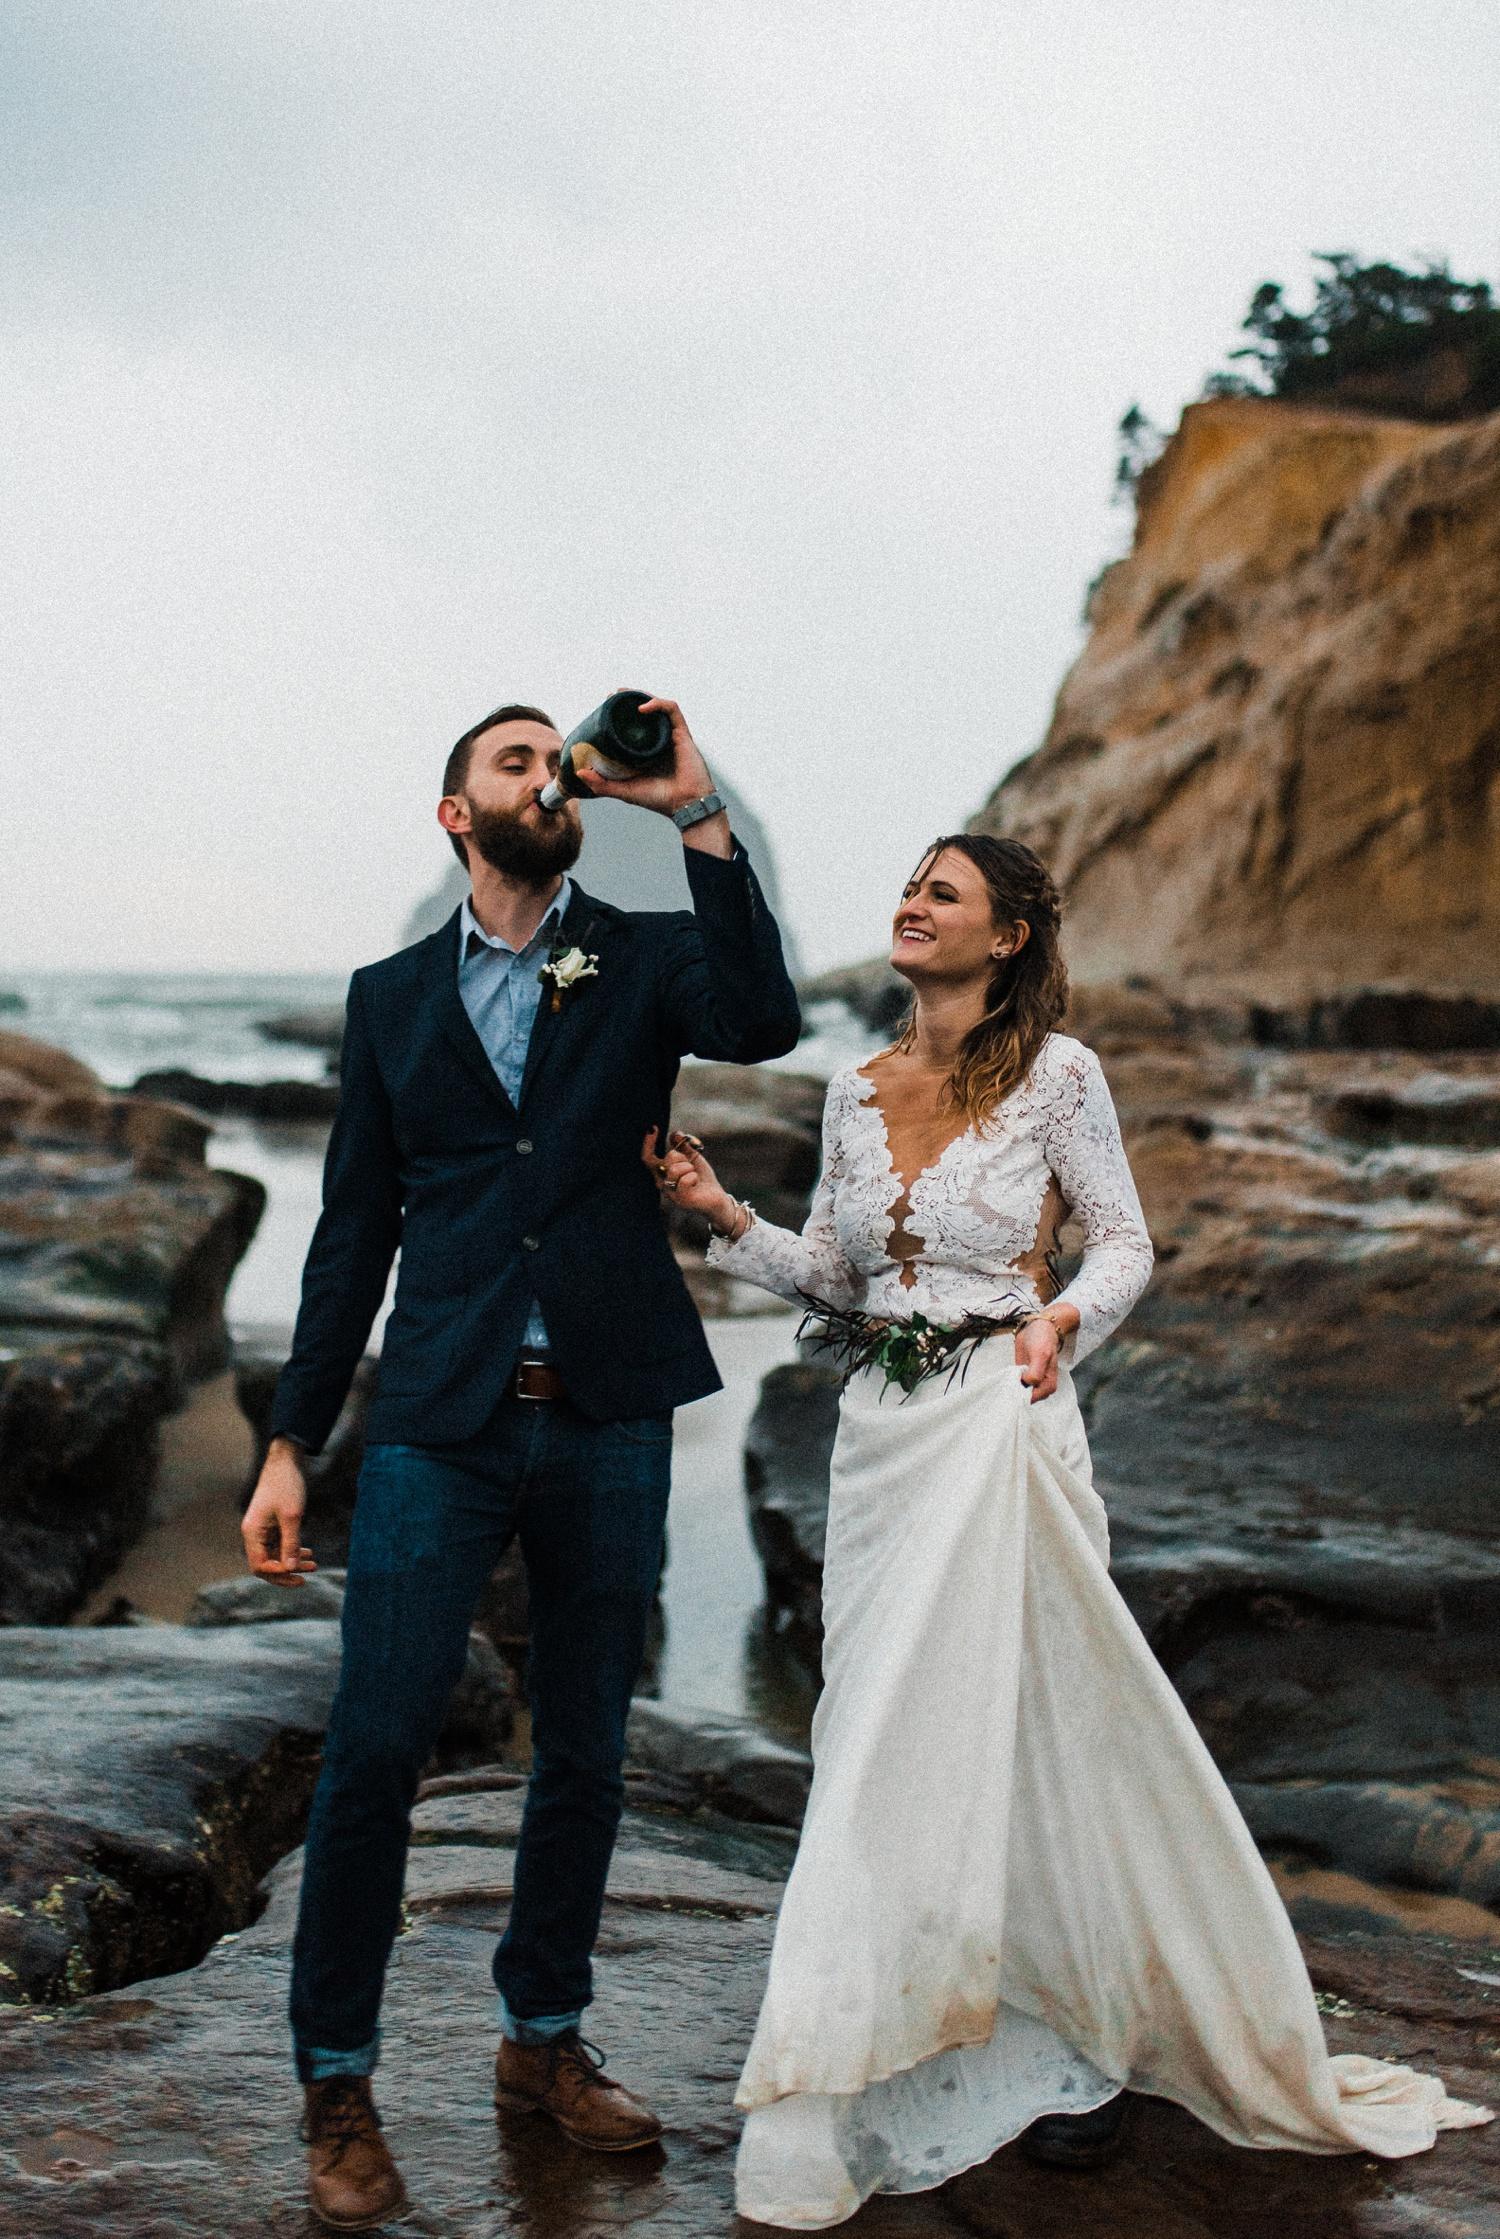 Oregon_Coast_Elopement_Wedding_The_Foxes_Photography_167-2.jpg